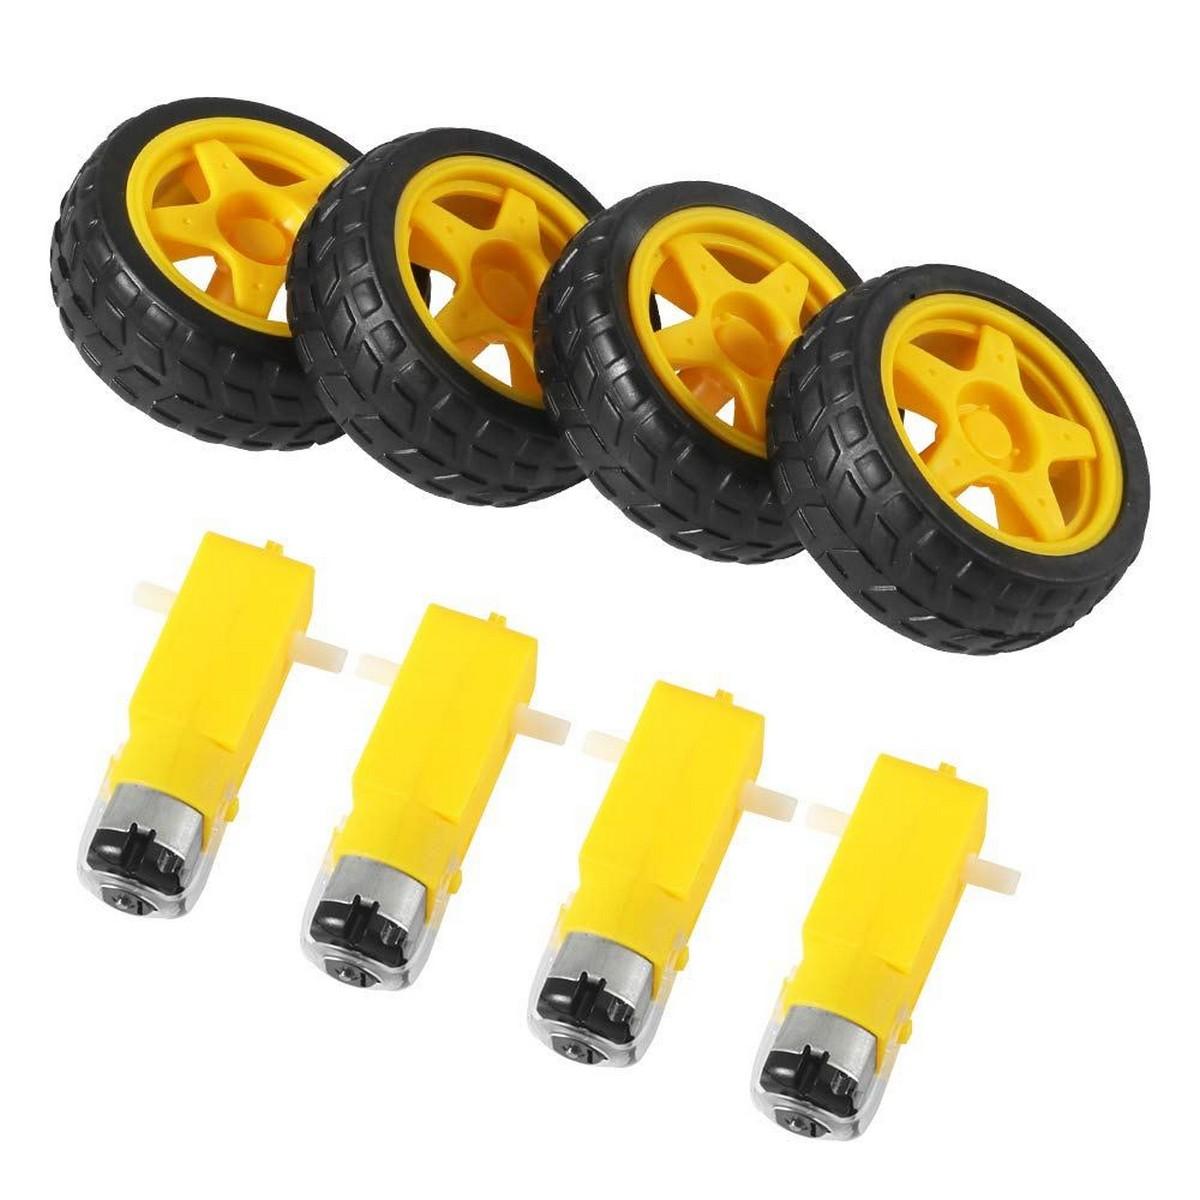 Pack of 4 DC 3-6V Smart Robot Car Tyre Wheel Gear Motor Set